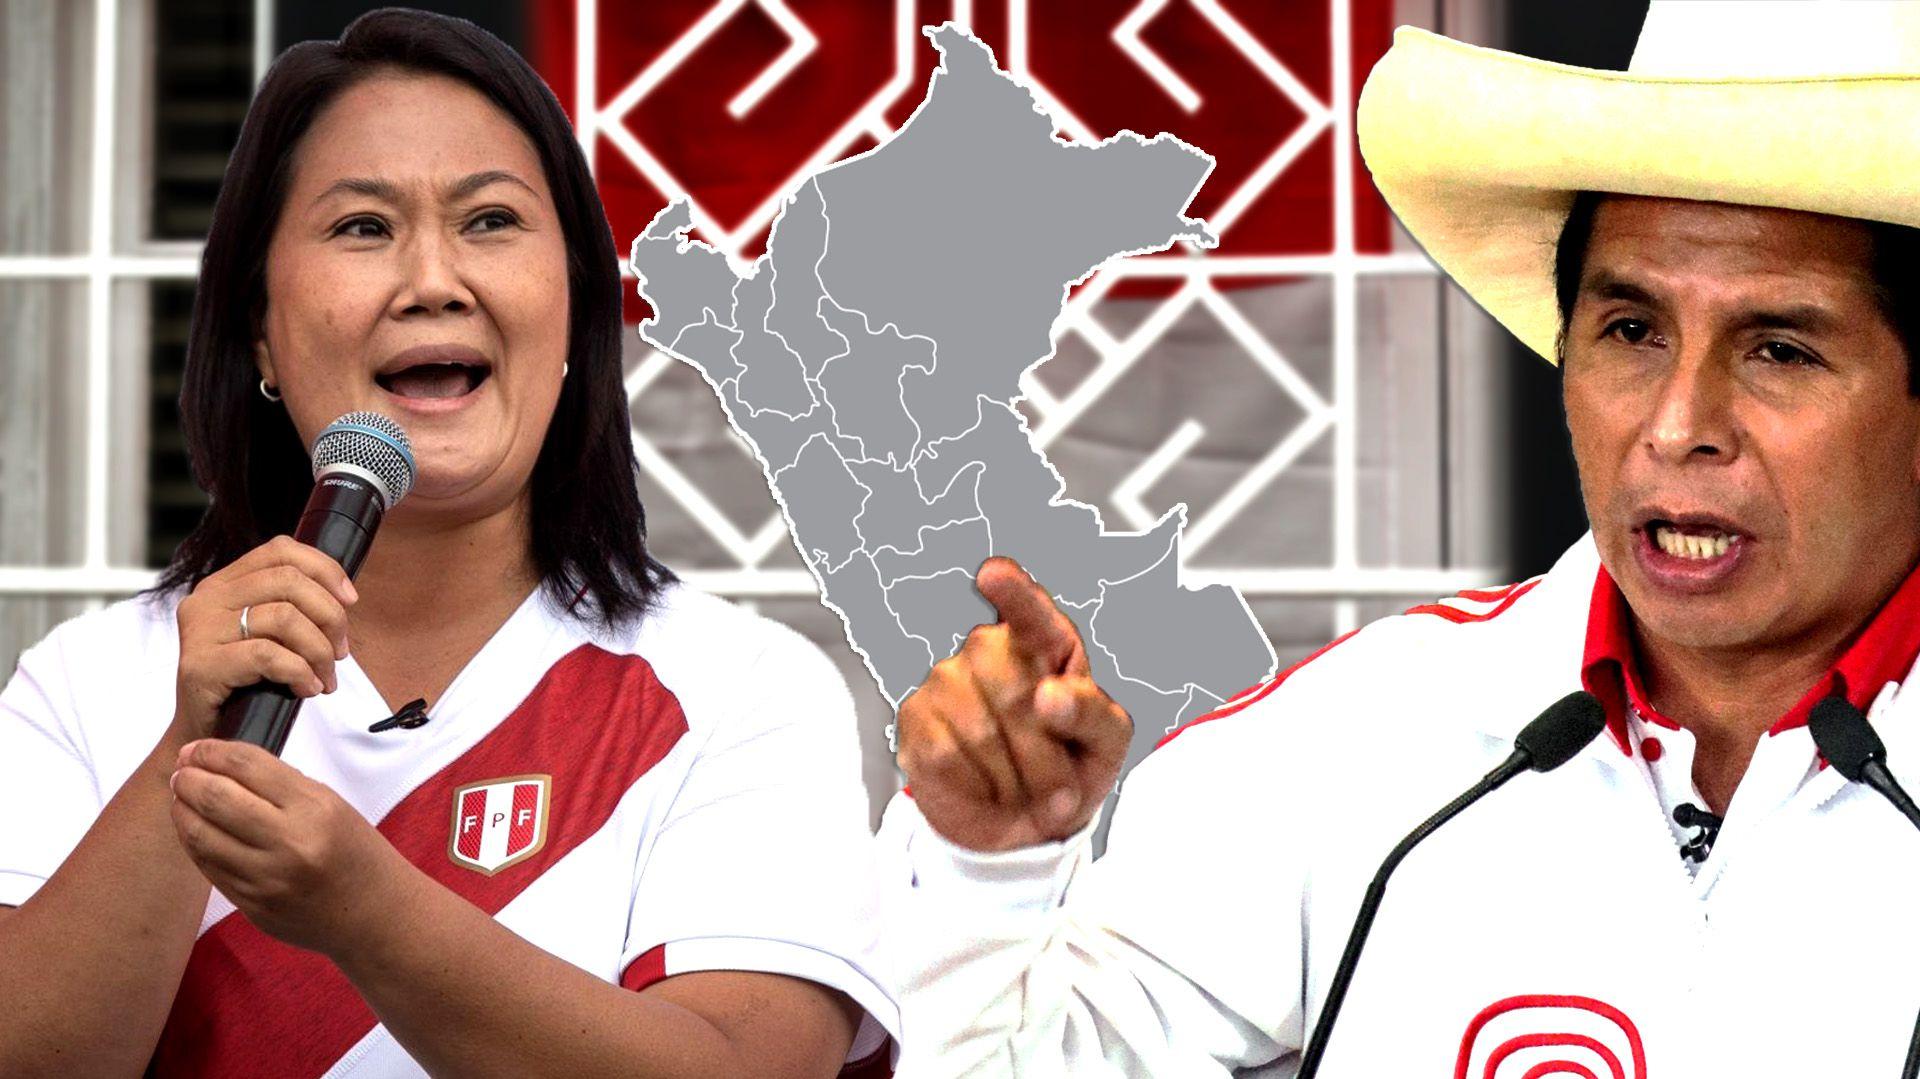 Keiko Fujimori Pedro Castillo - Elecciones en Perú